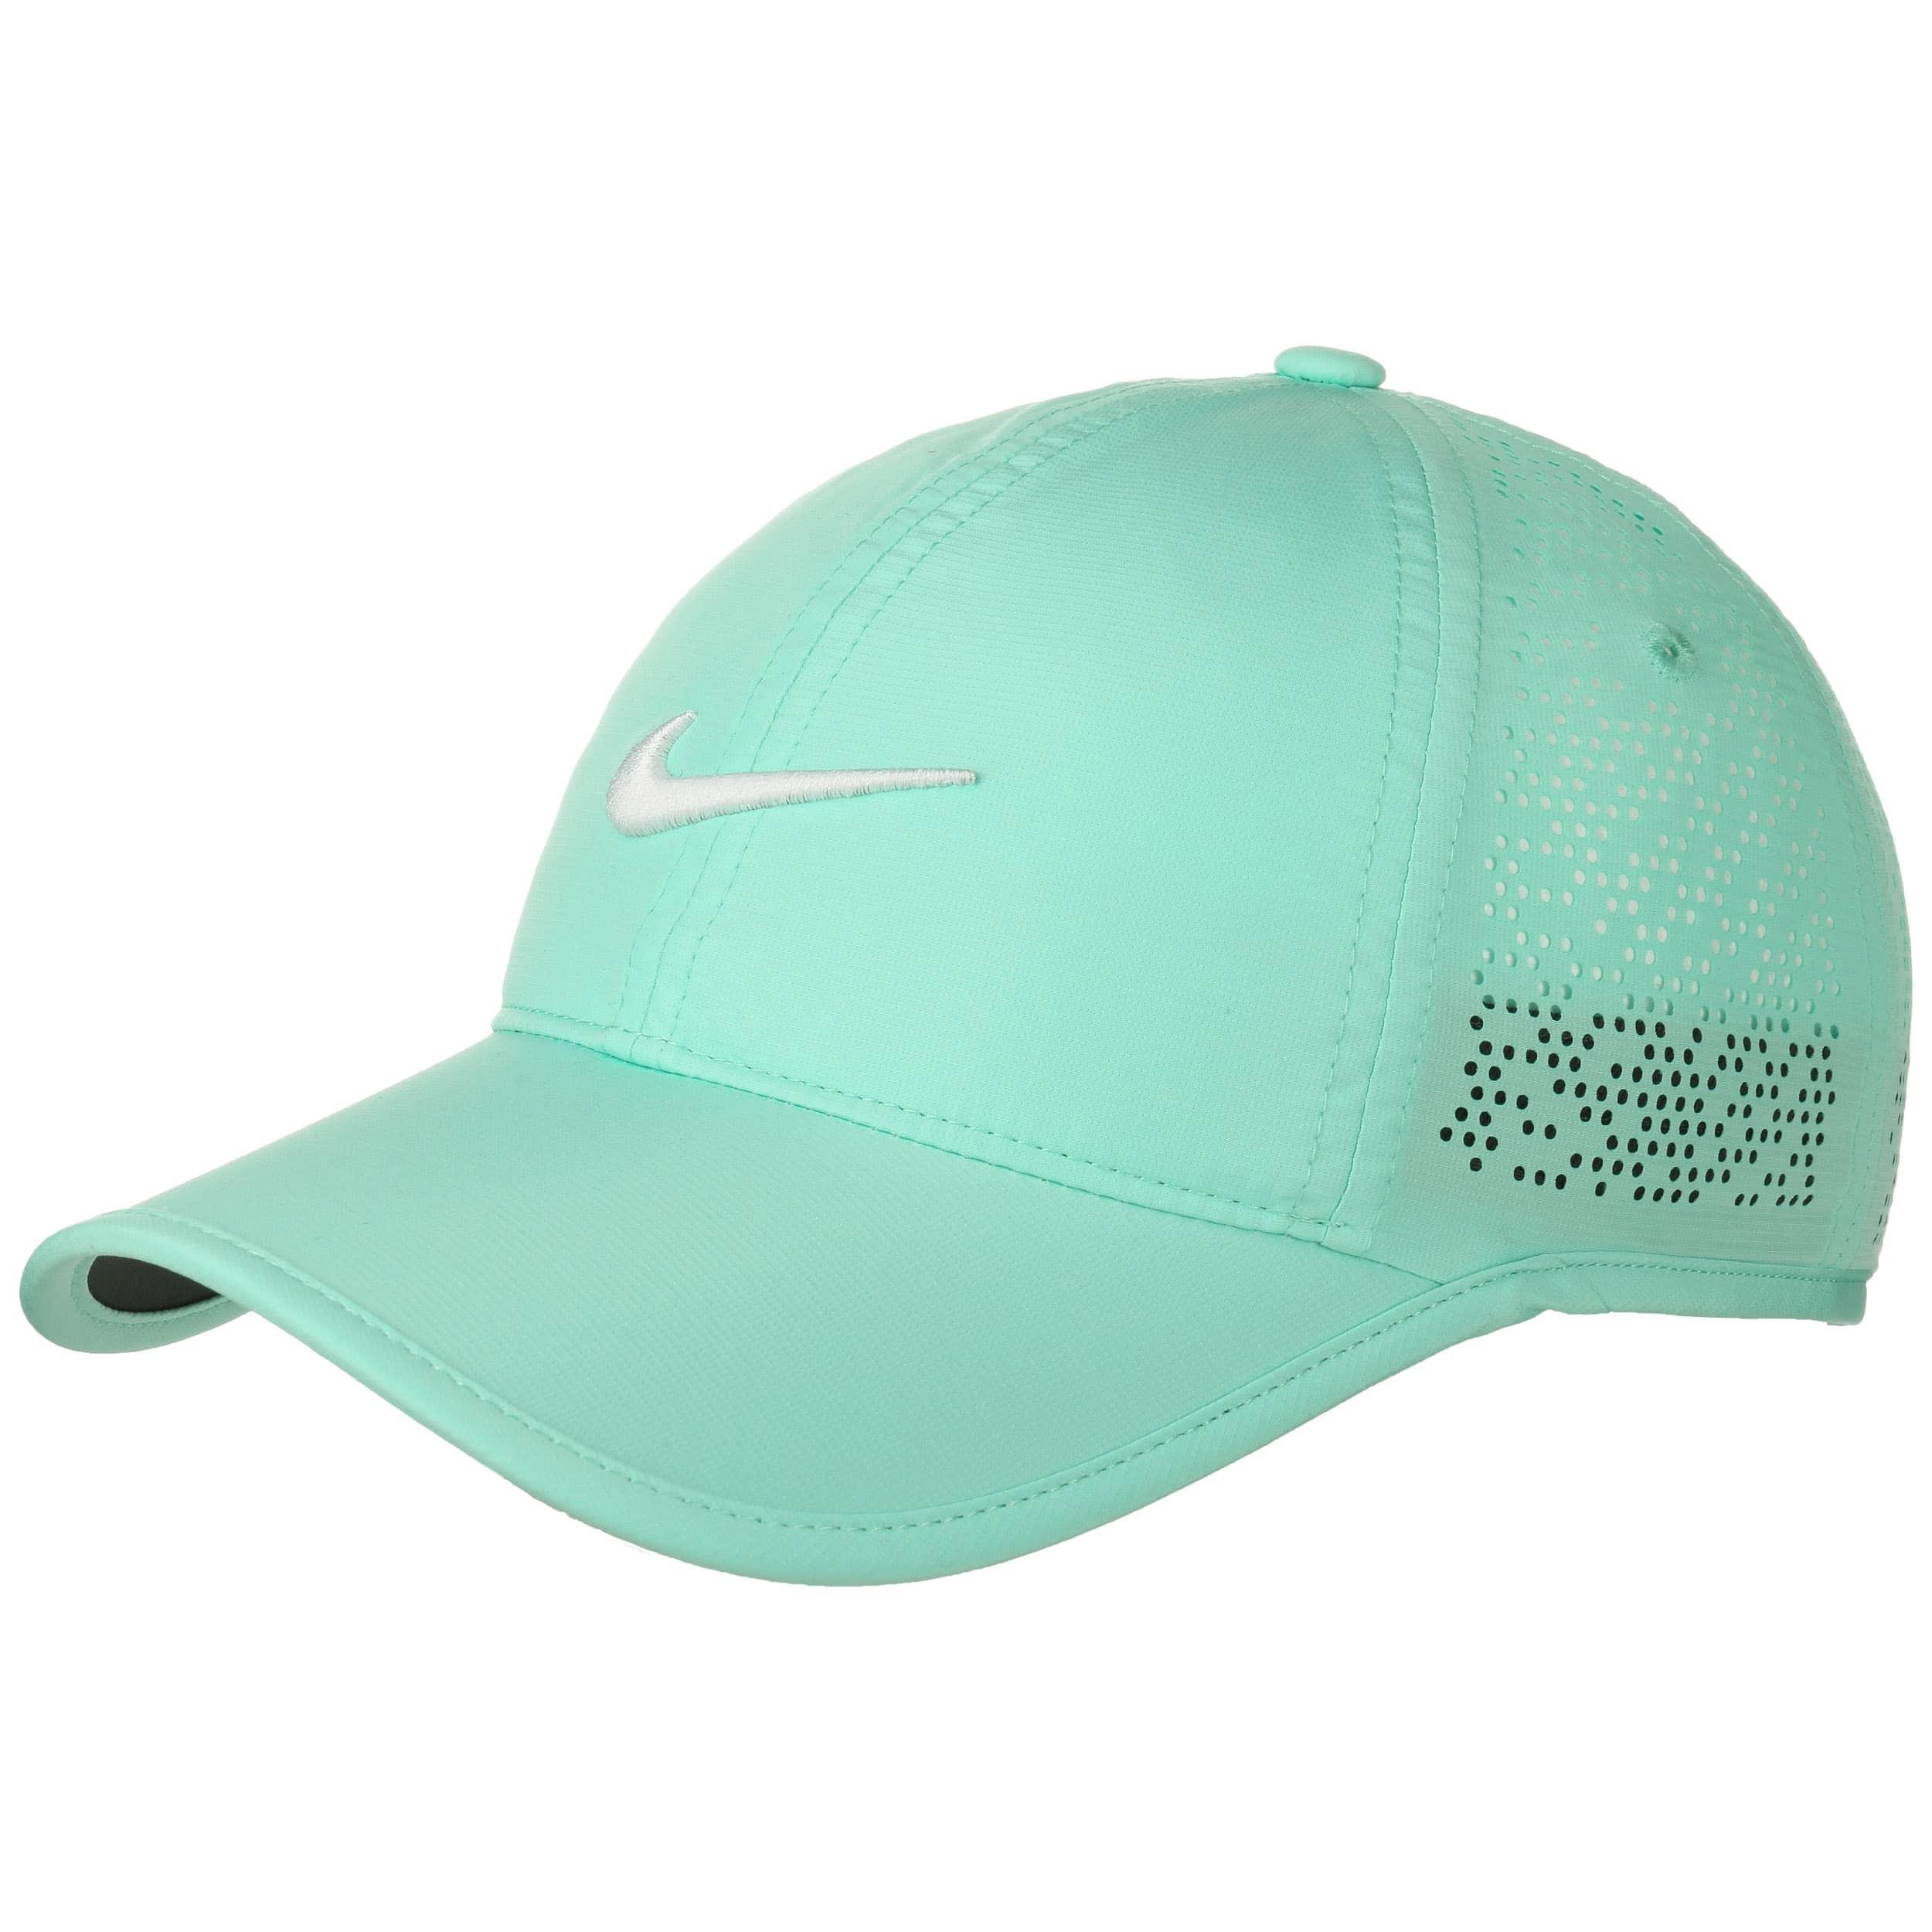 ... Swoosh Perforation Cap by Nike - bianco 5 ... 09acbb981fec